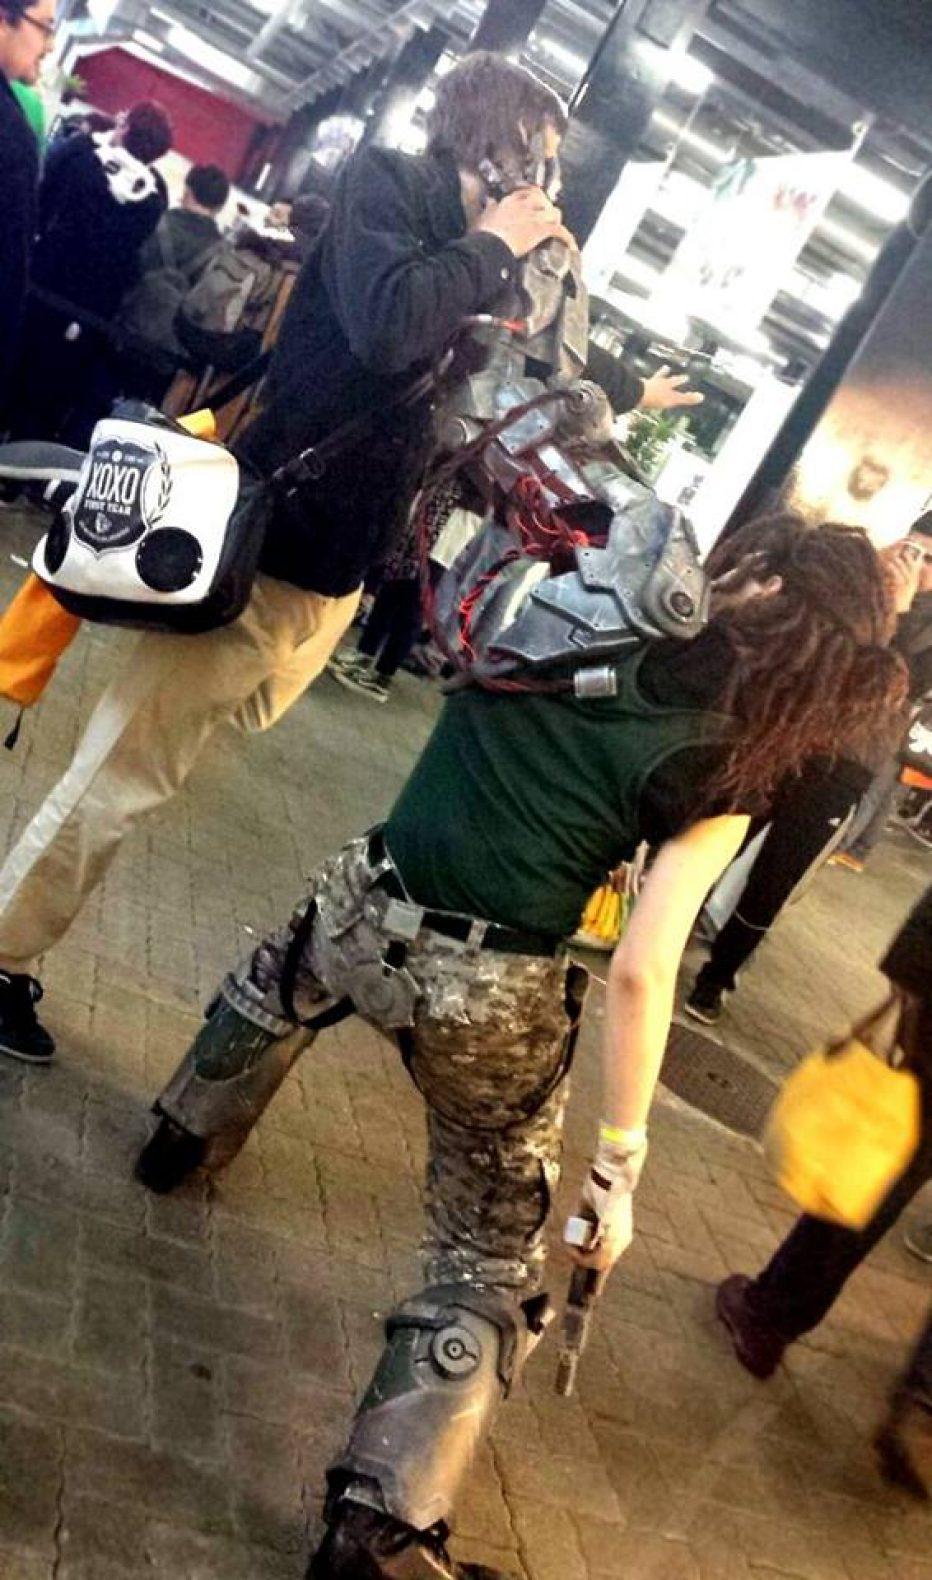 Bionic-Commando-Nathan-Spencer-Cosplay-Gamers-Heroes-6.jpg